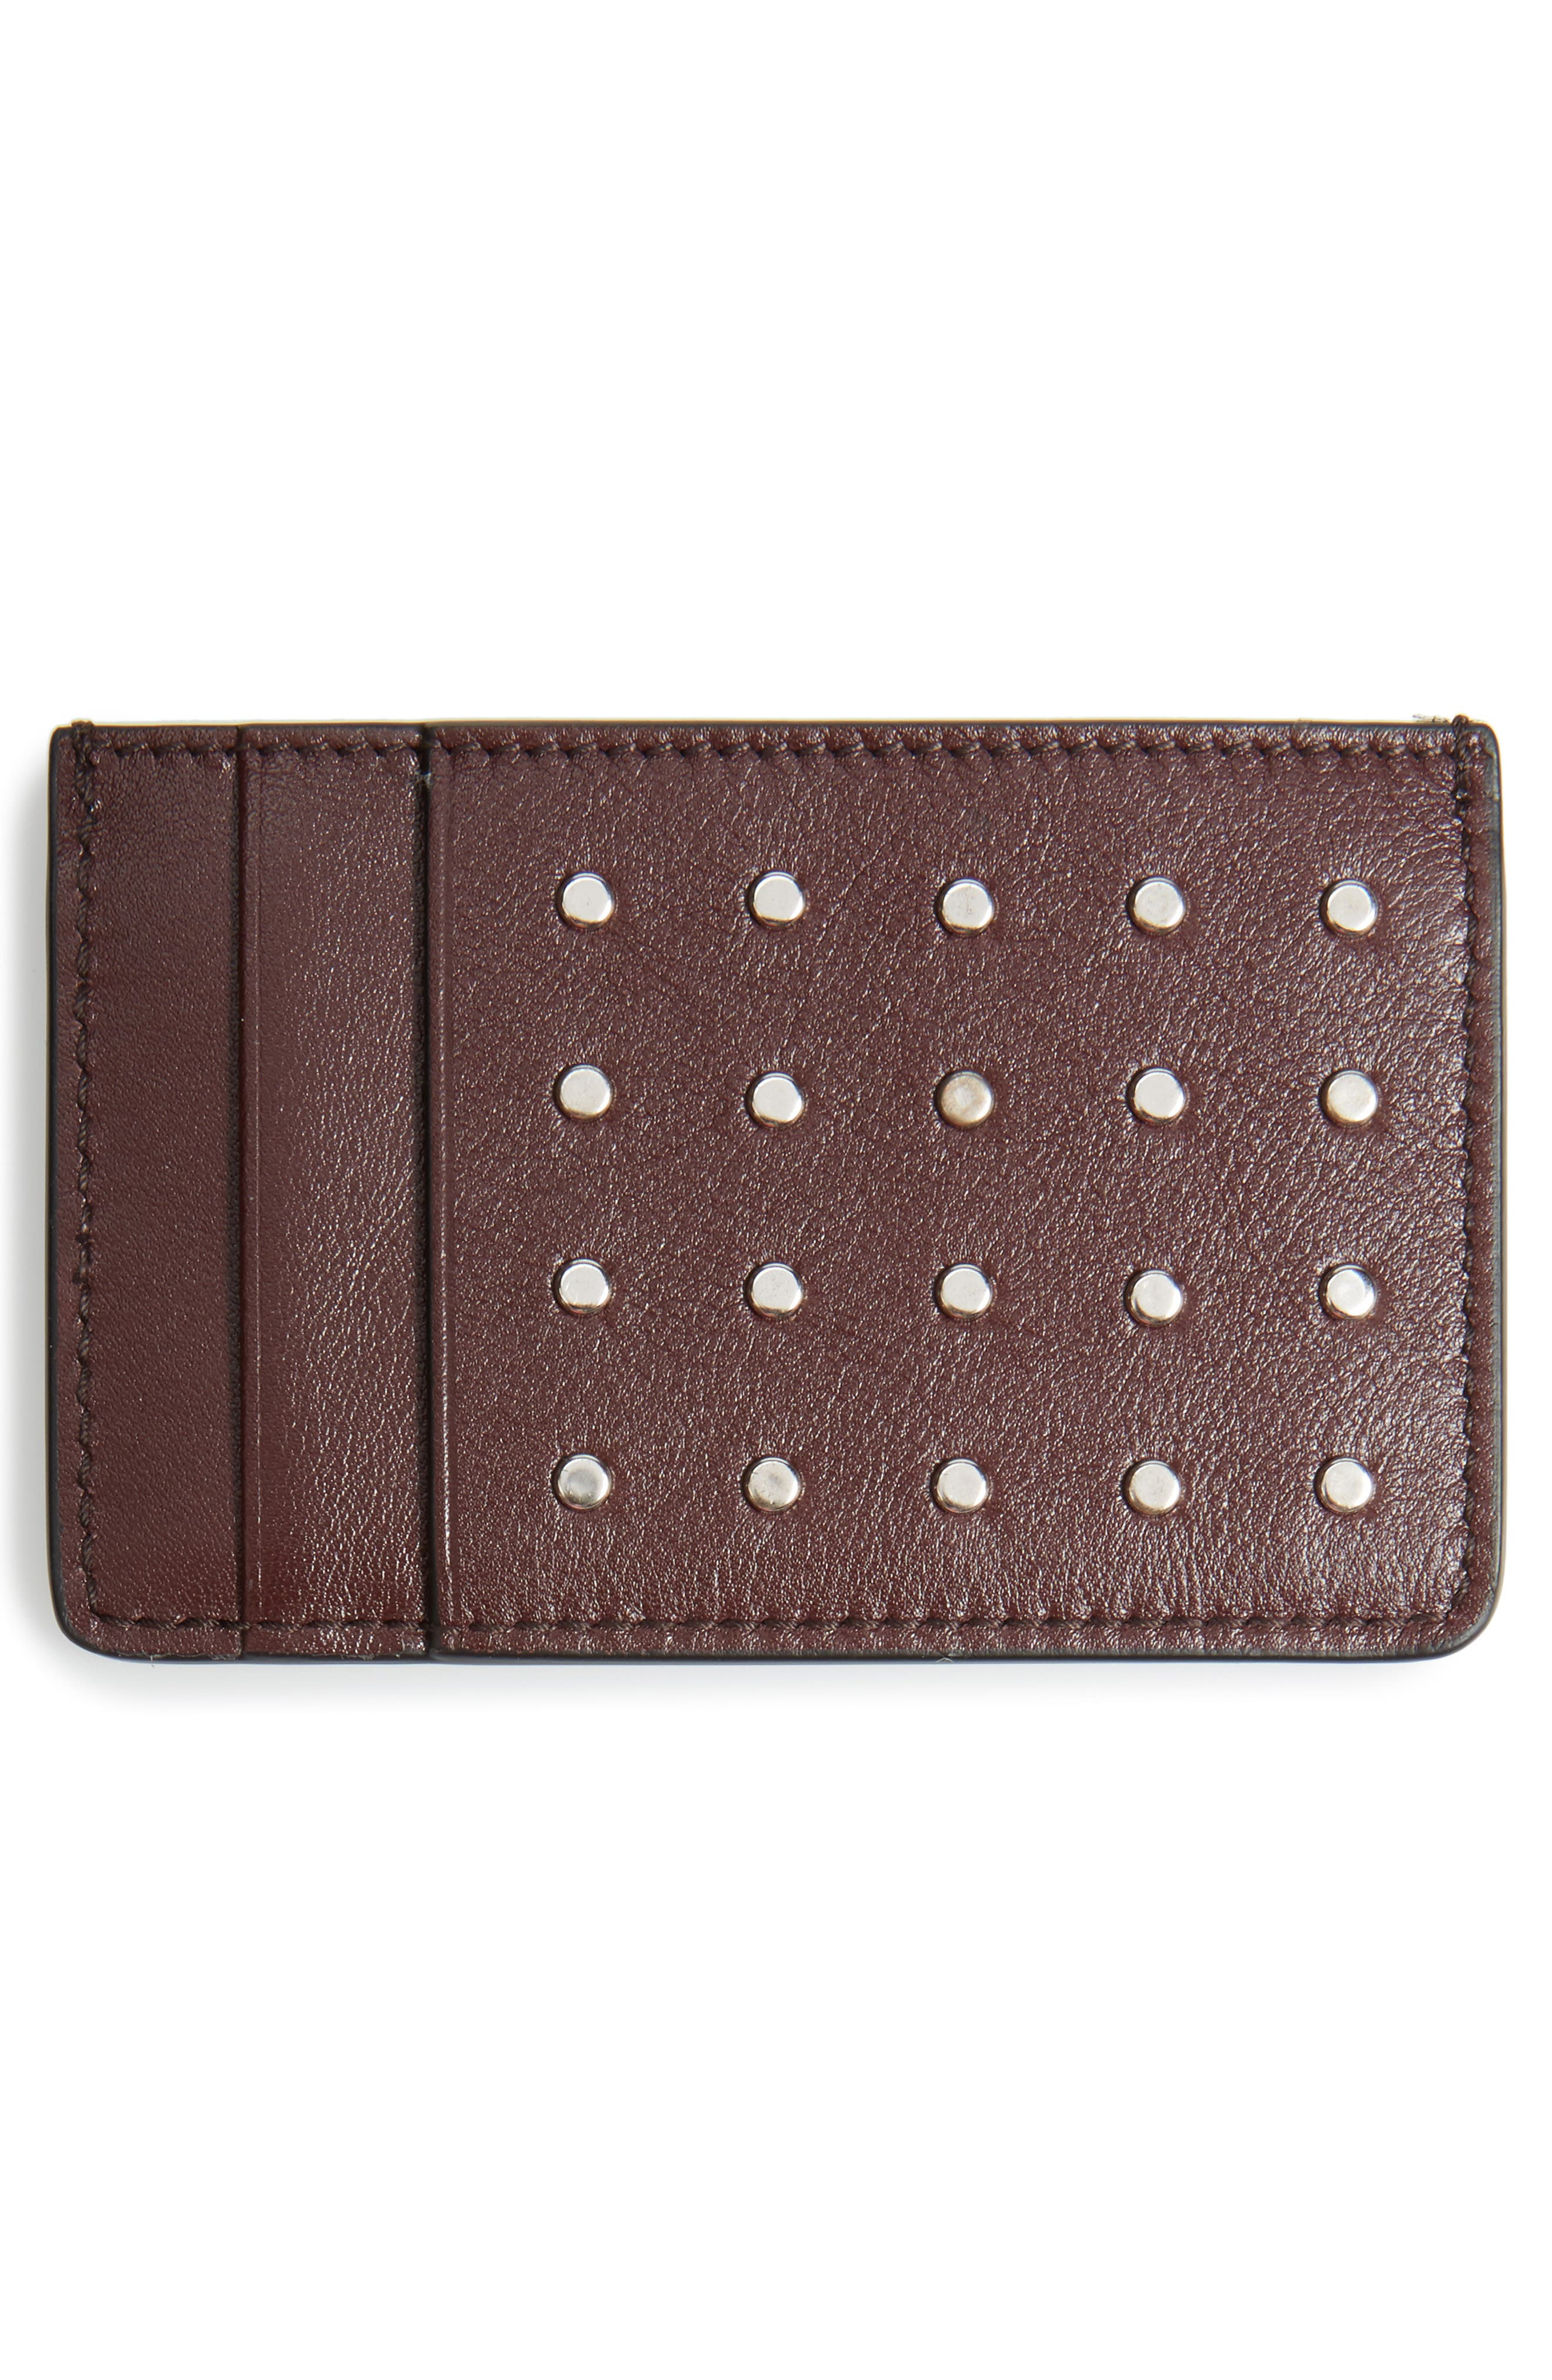 Alternate Image 2  - Alexander McQueen Studded Leather Card Case